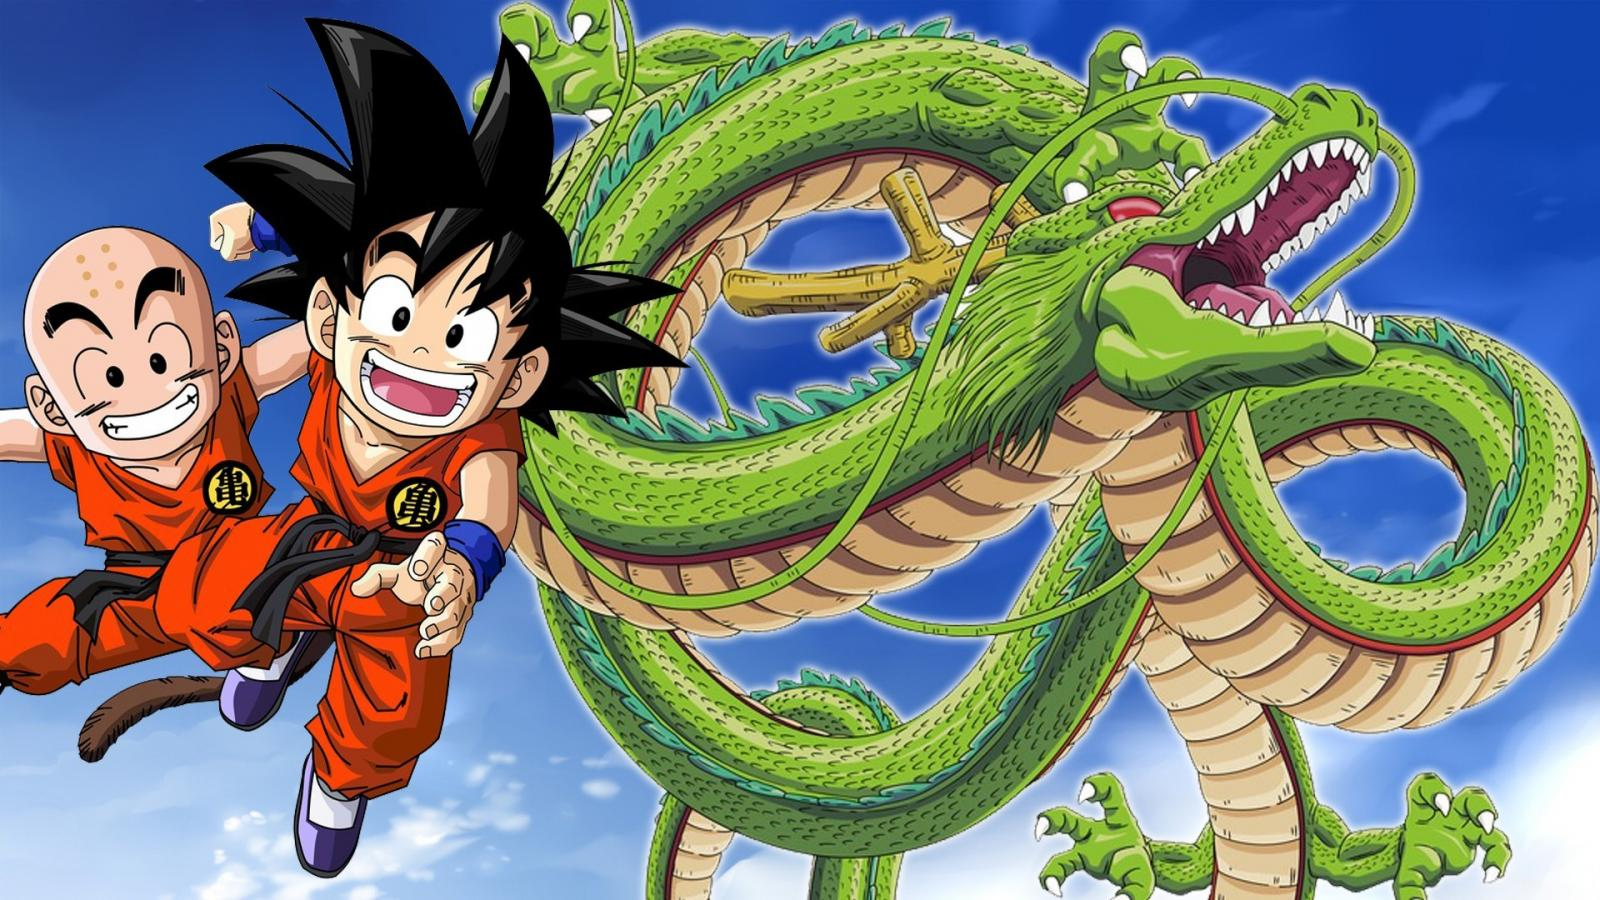 Cartoon District Wallpapers 40 Best Goku Wallpaper hd for PC Dragon 1600x900